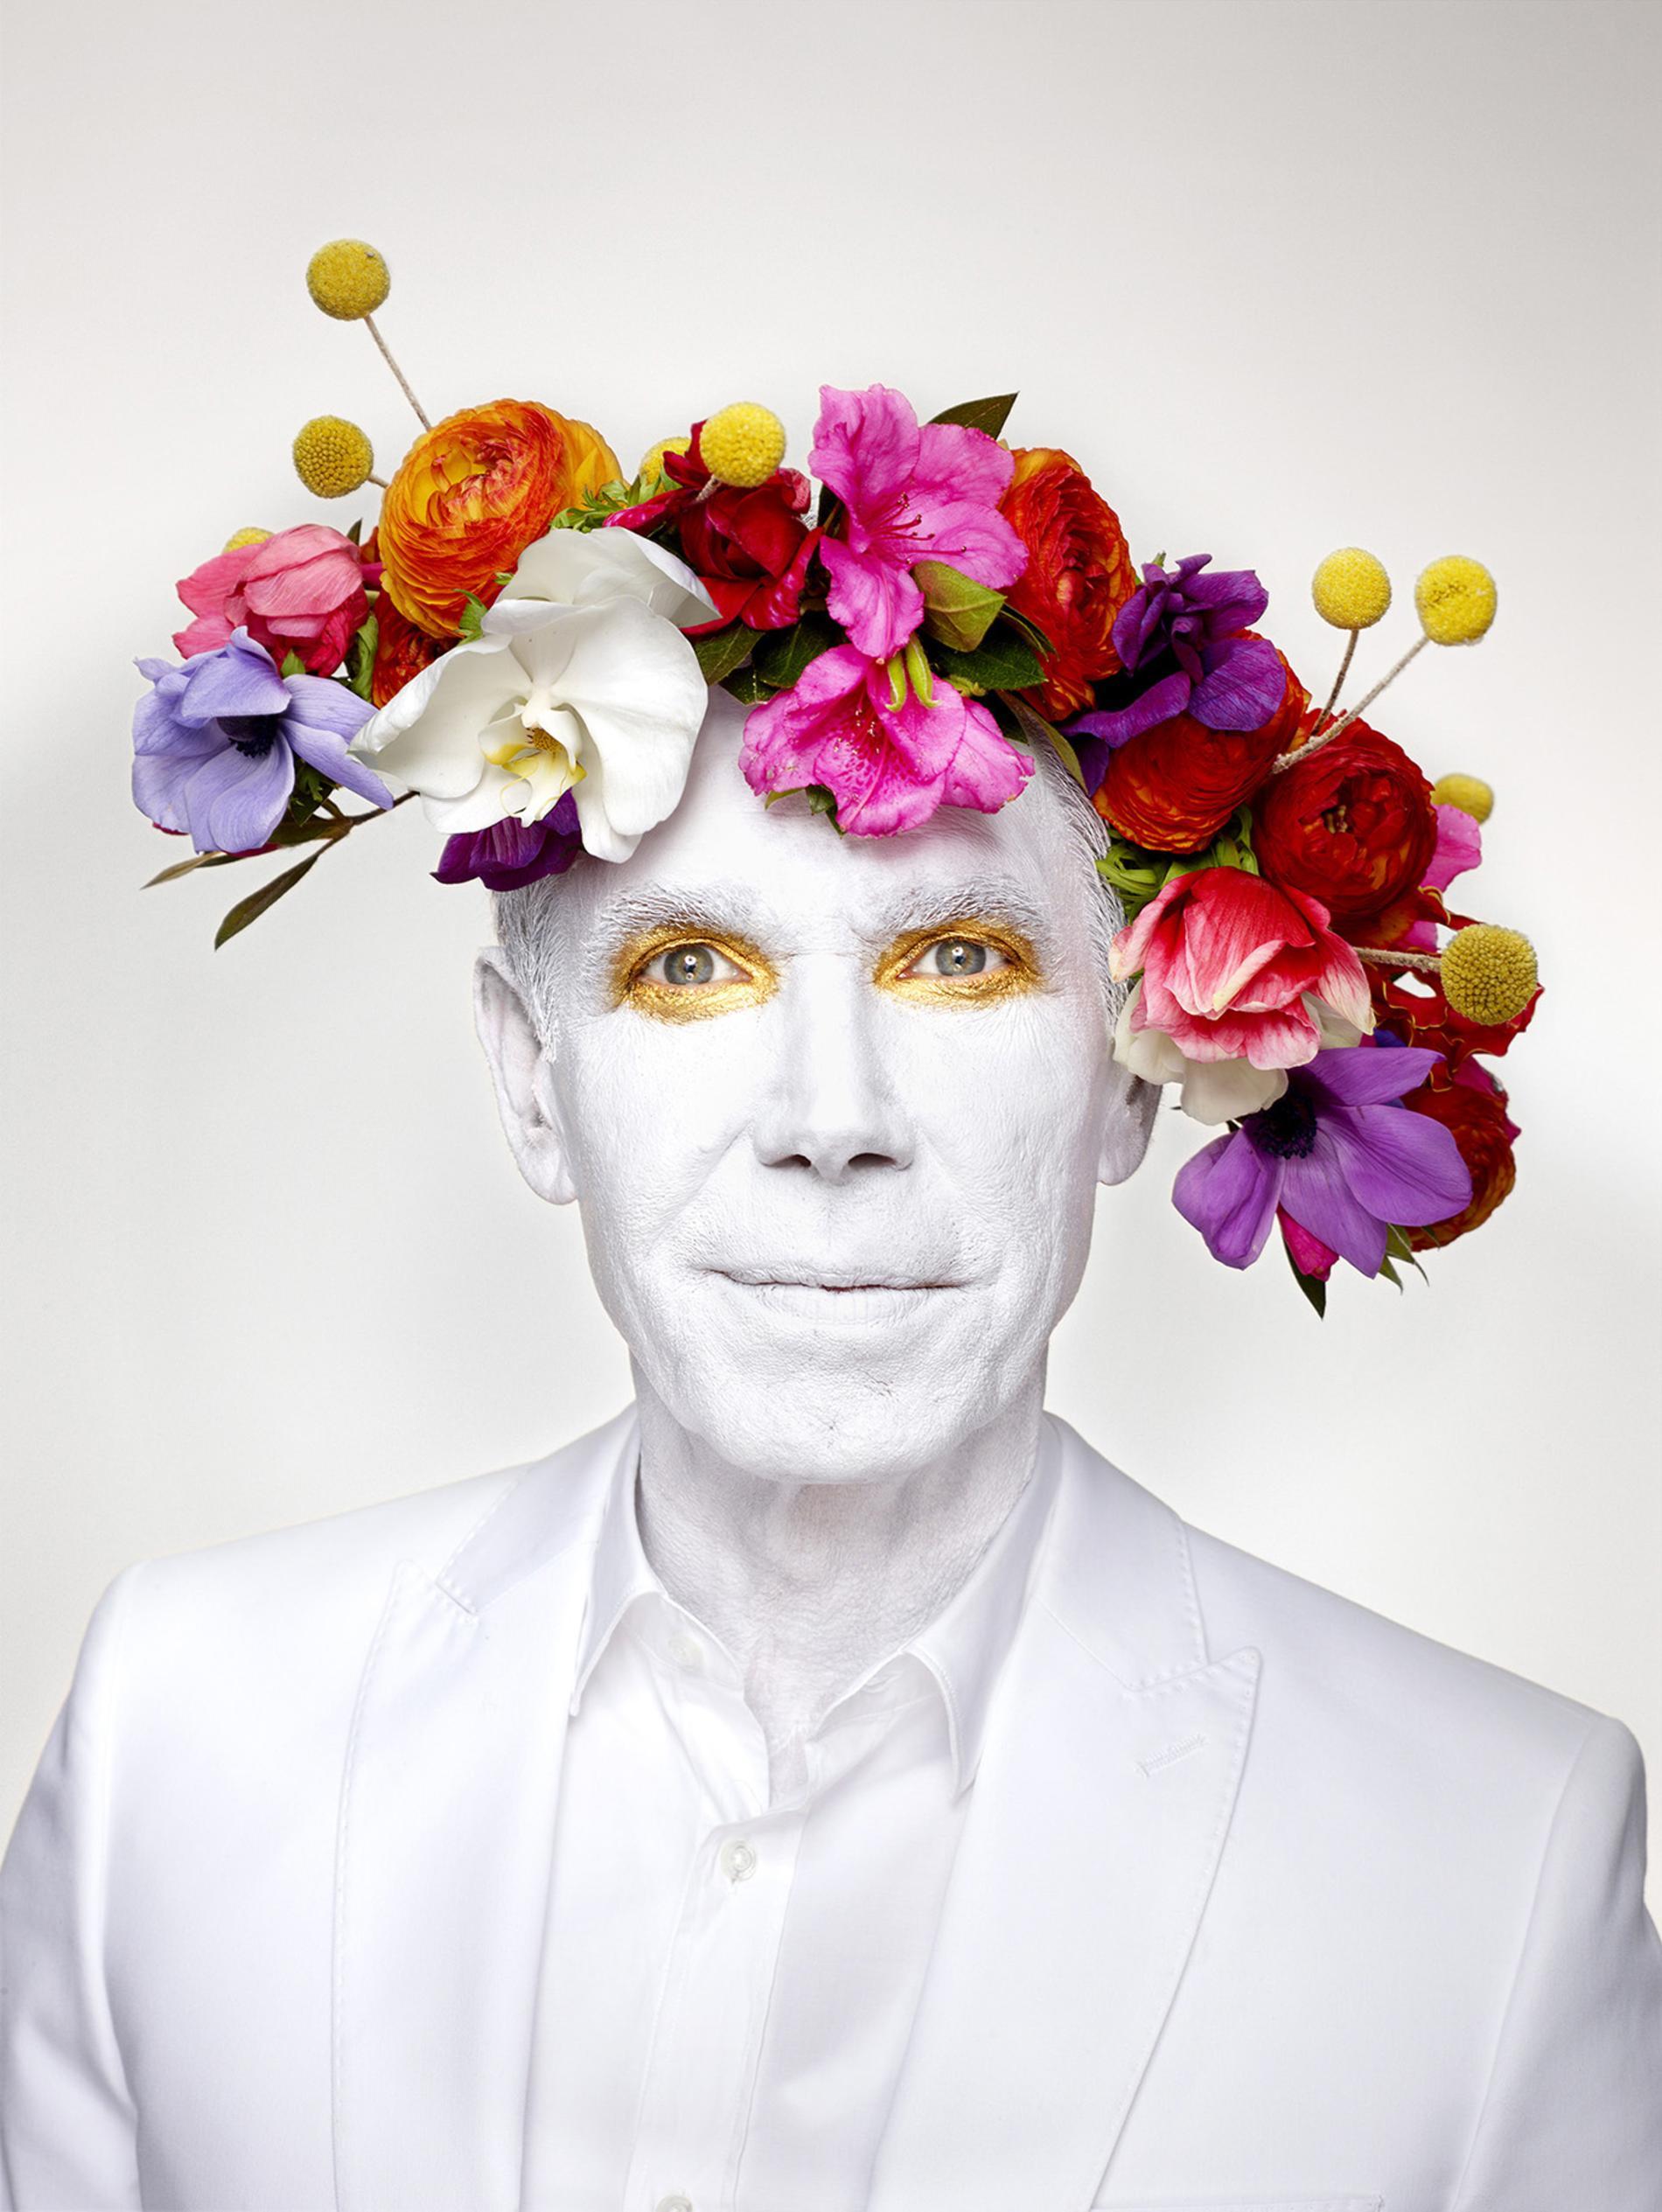 Bien connu Jeff Koons | Alain.R.Truong GD92